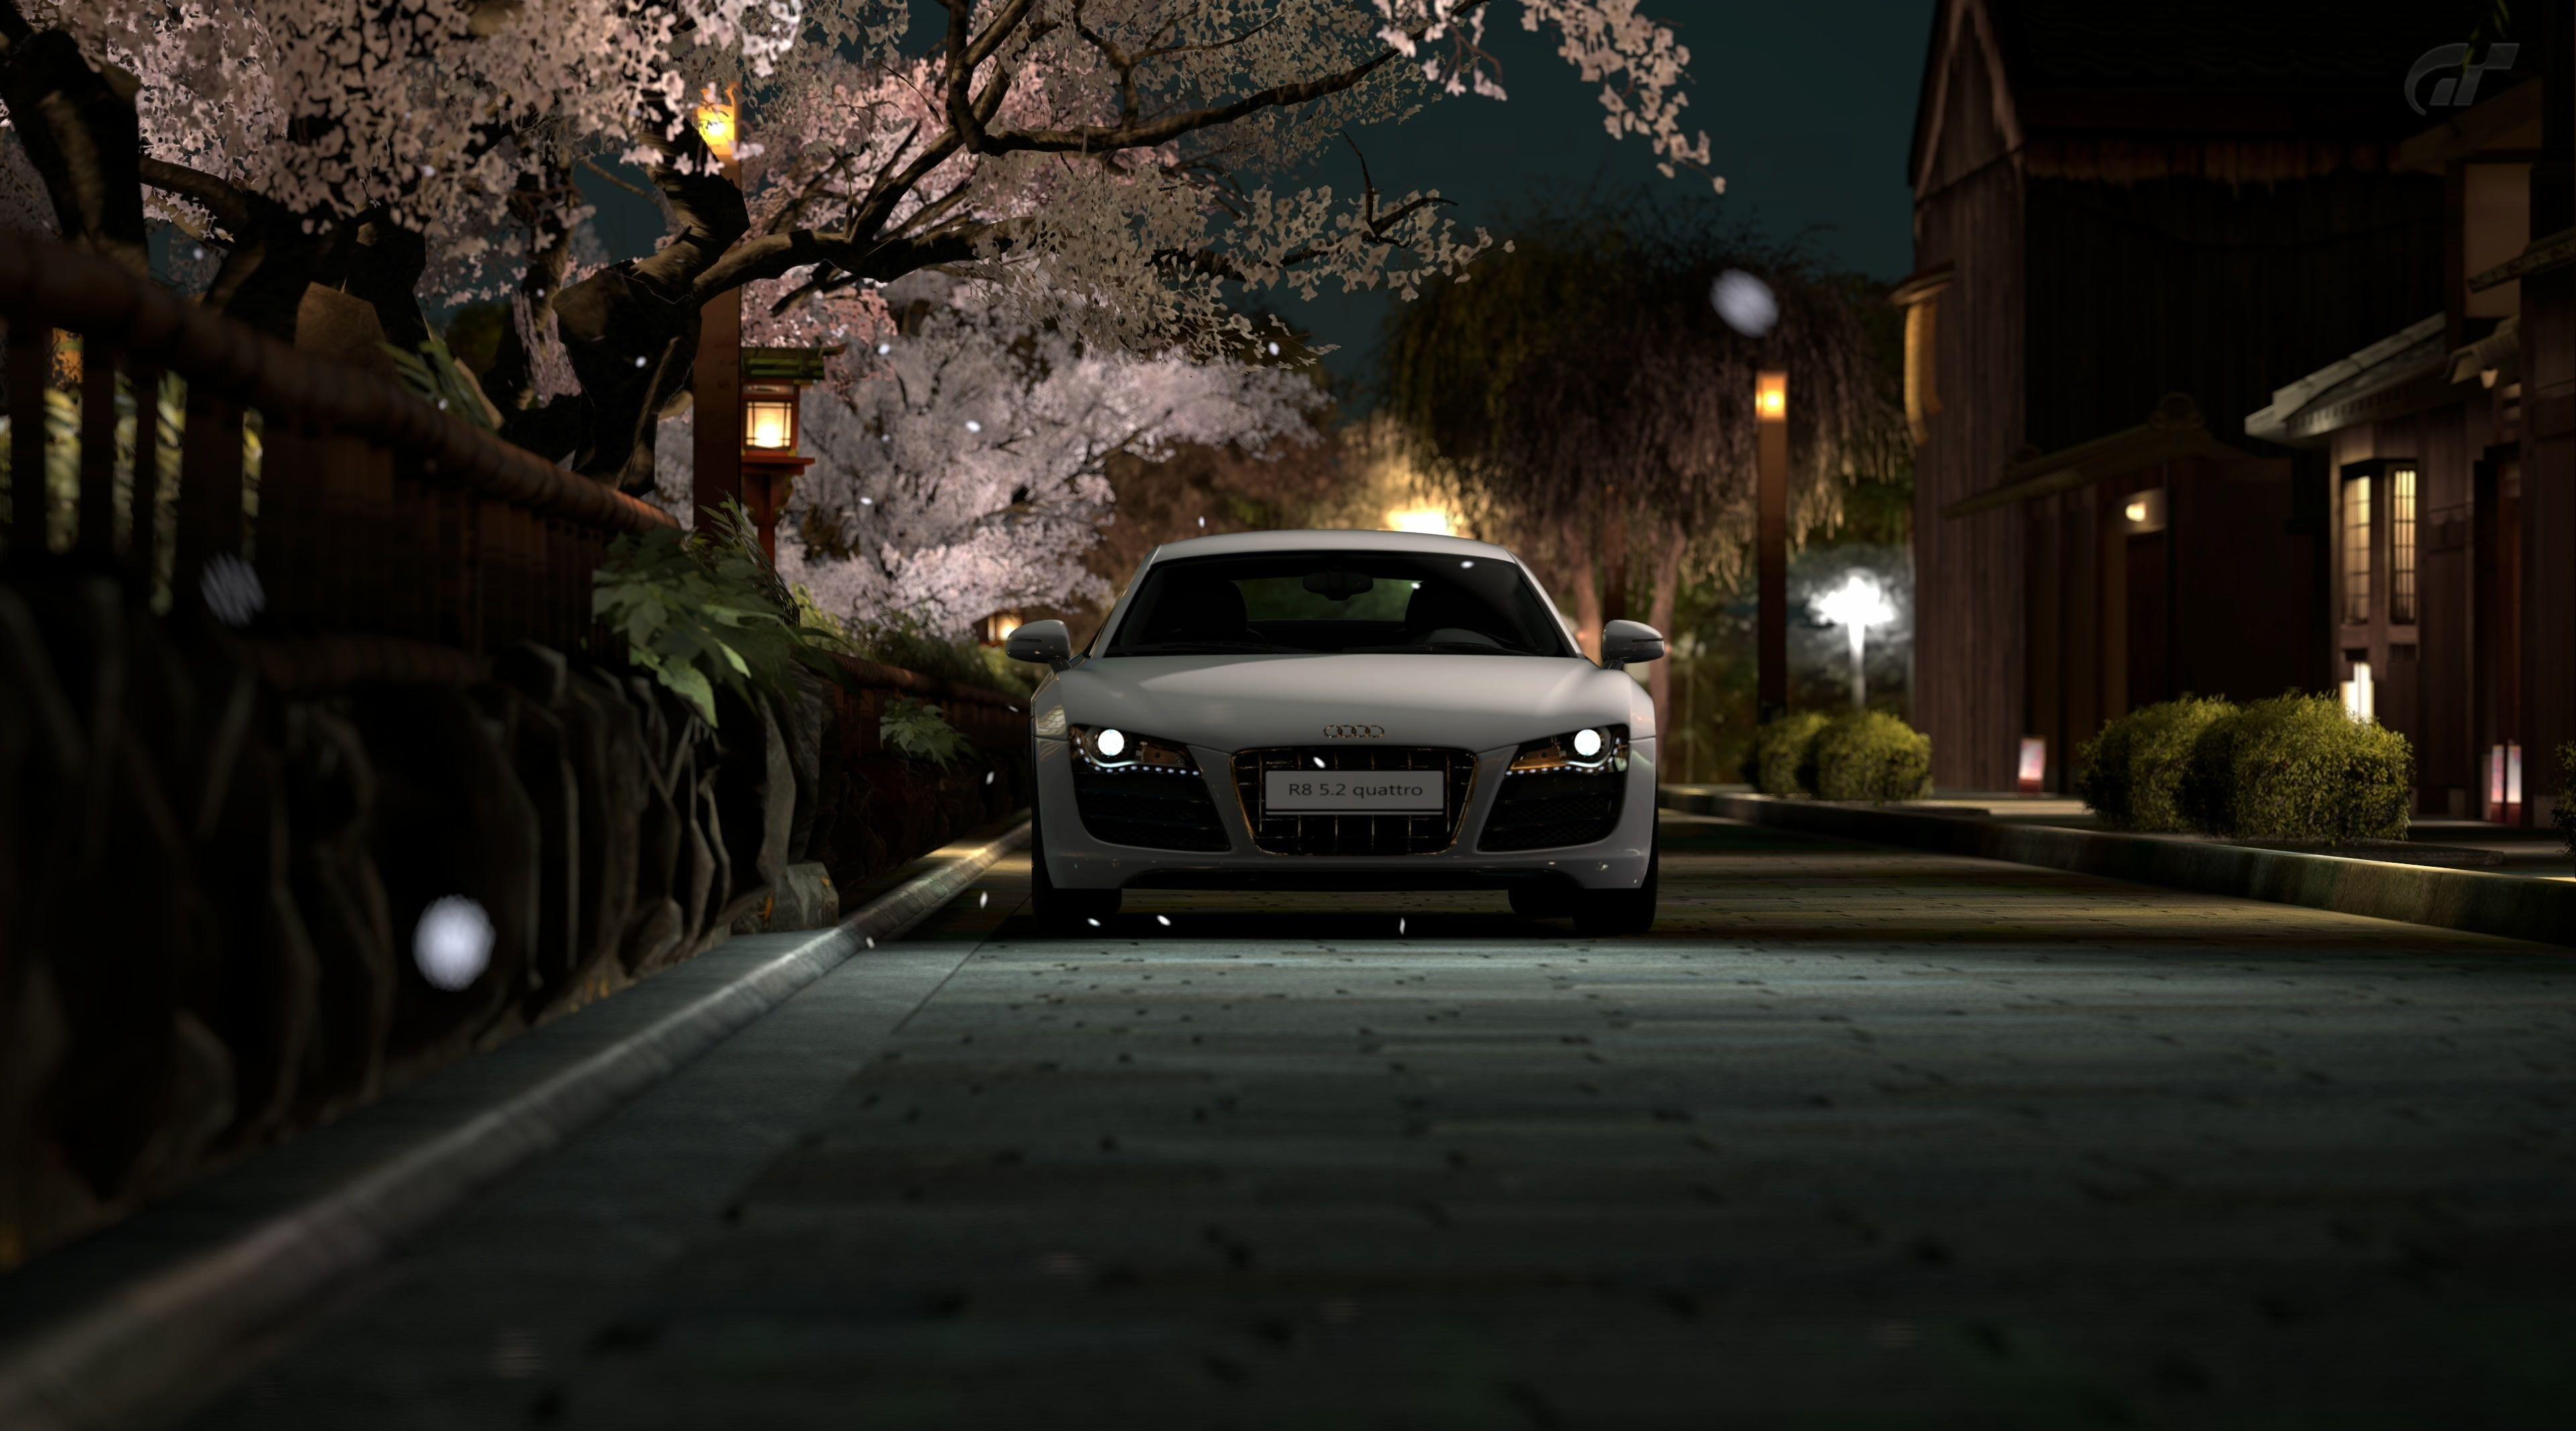 R8 In Japan Gt5 White Car Games Gran Turismo Spring Audi Japan Video Game Audi R8 Gt5 Gran Turismo 5 Sakura 4k Wallpaper Hd Wallpaper Pc Audi R8 Audi